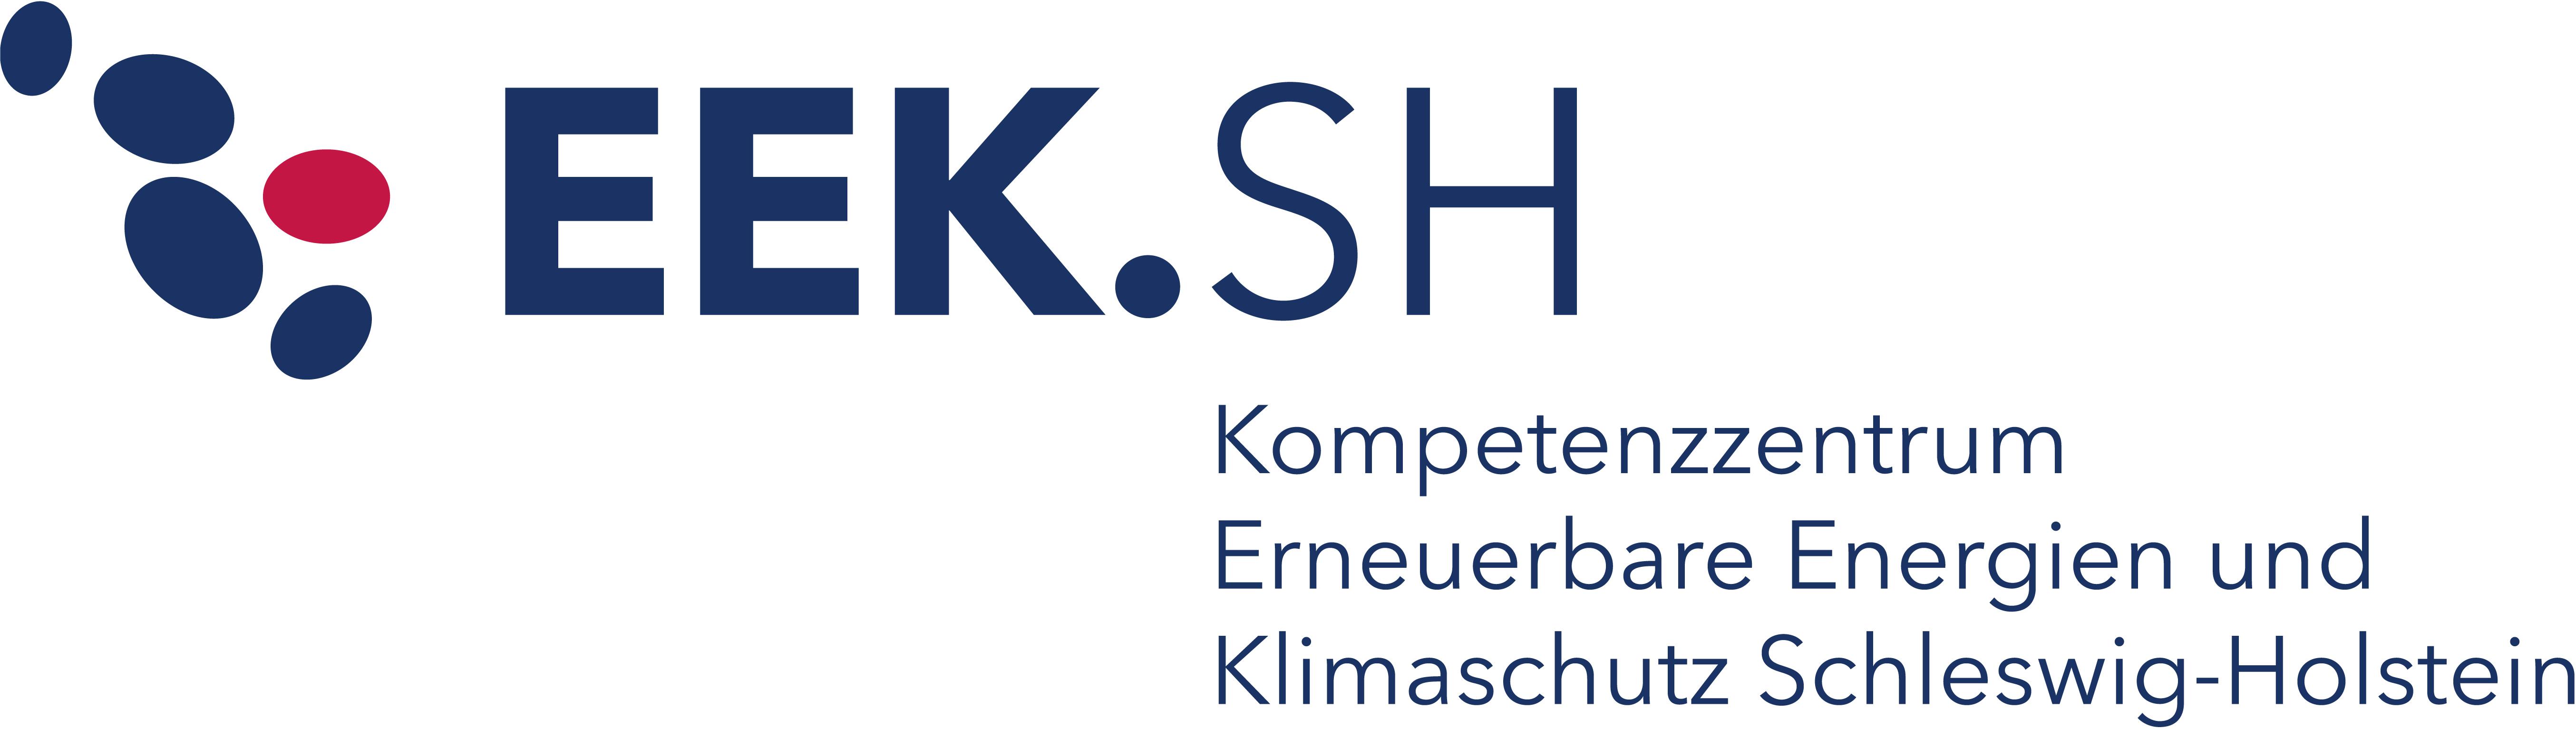 EEK_Logo_EPS_FE2018 - Kopie